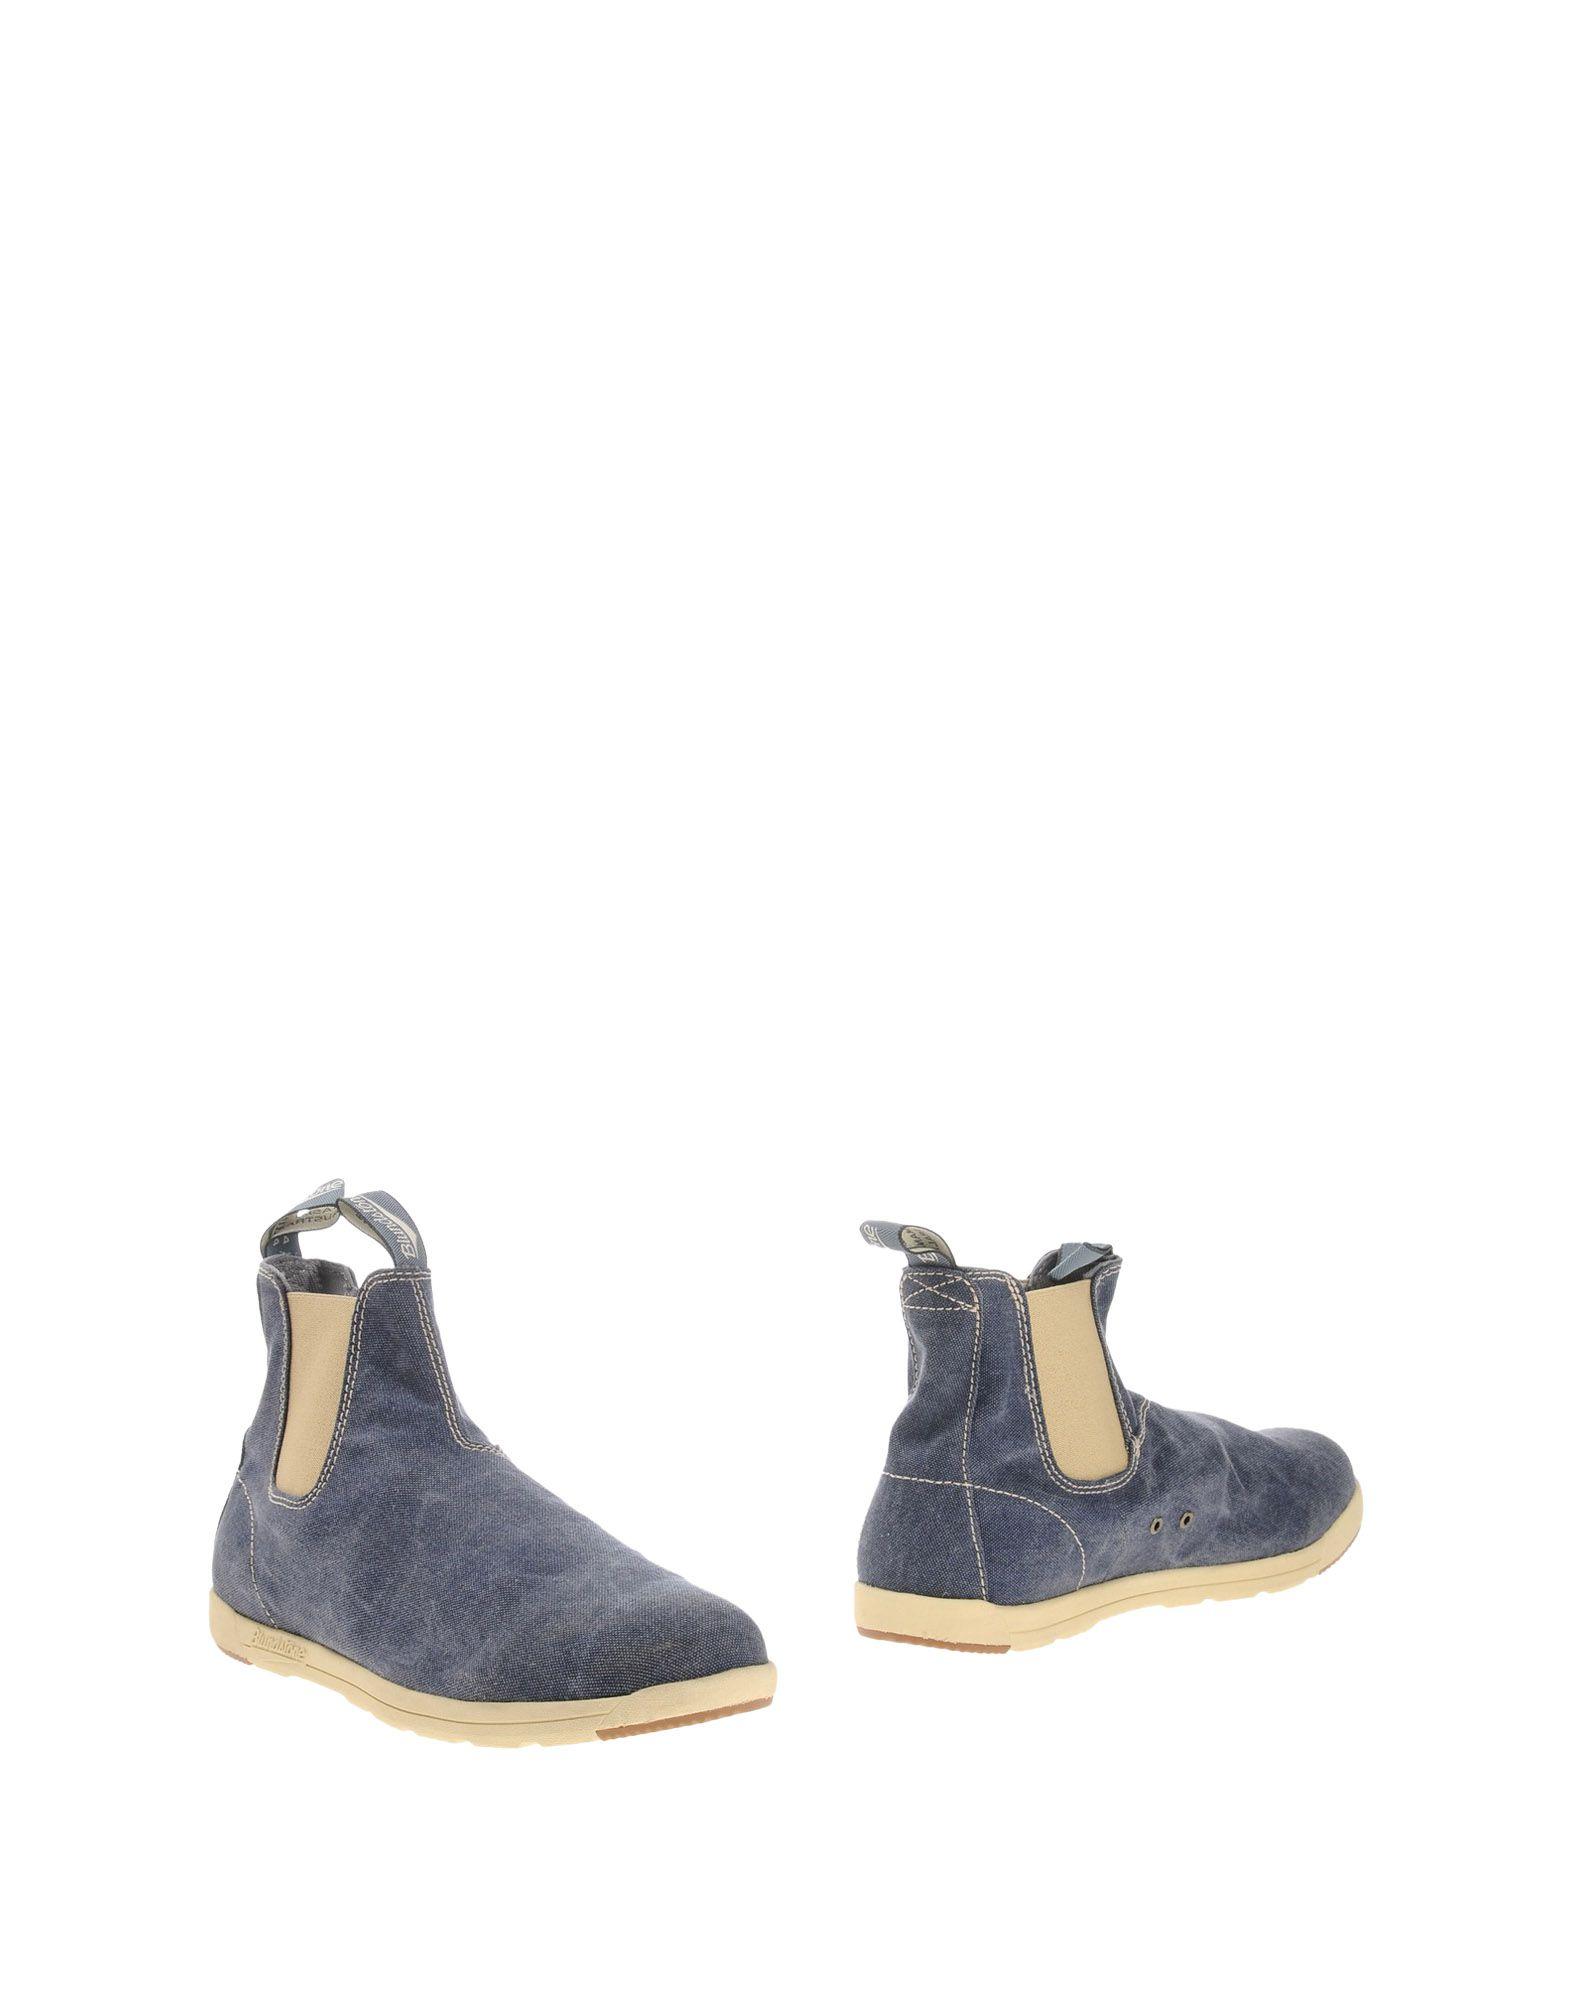 BLUNDSTONE Полусапоги и высокие ботинки magazzini del sale полусапоги и высокие ботинки